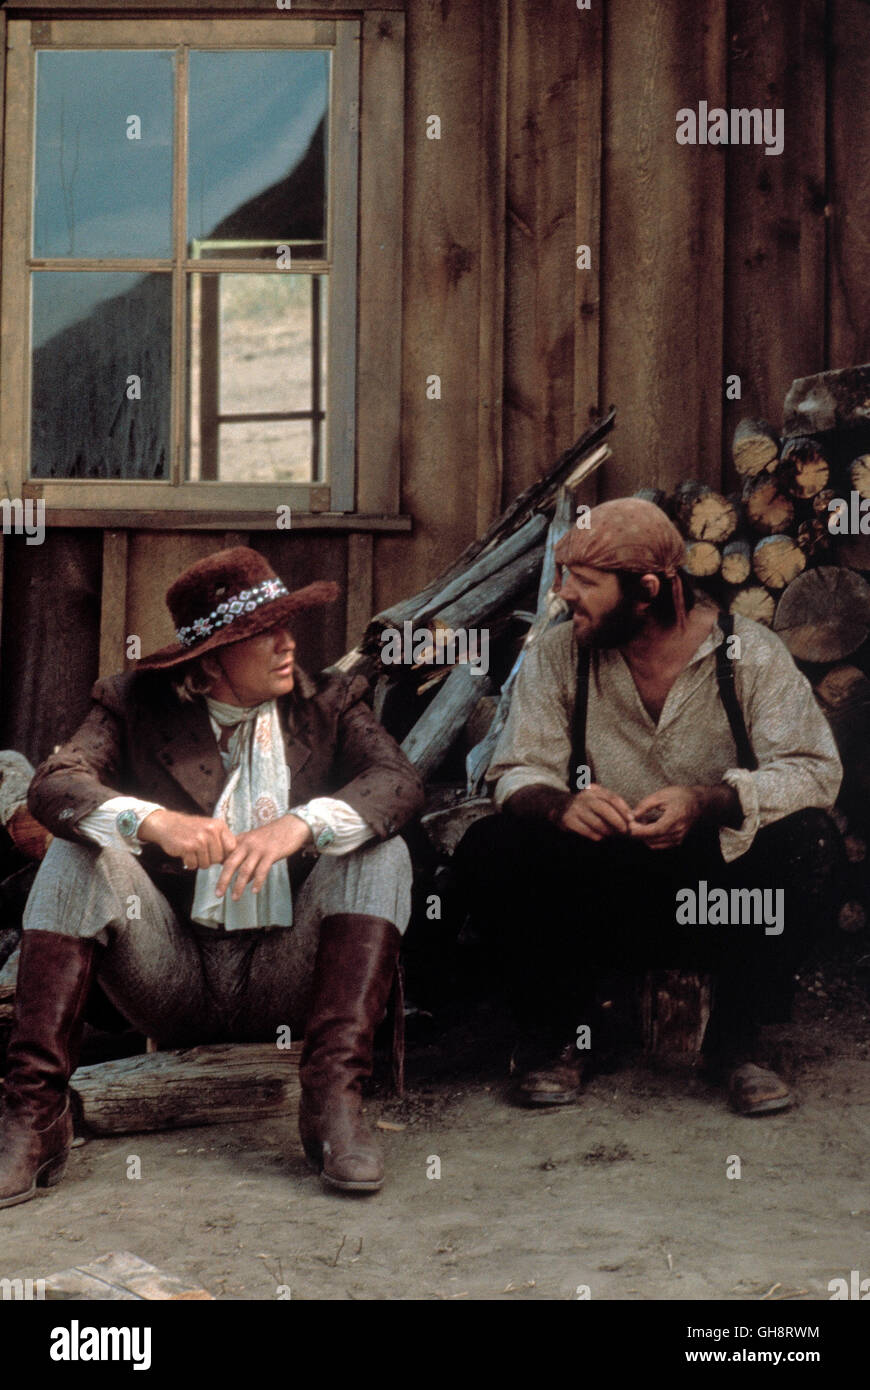 DUELL AM MISSOURI / The Missouri Breaks USA 1976 / Arthur Penn MARLON BRANDO (Robert E. Lee Clayton), JACK NICHOLSON - Stock Image